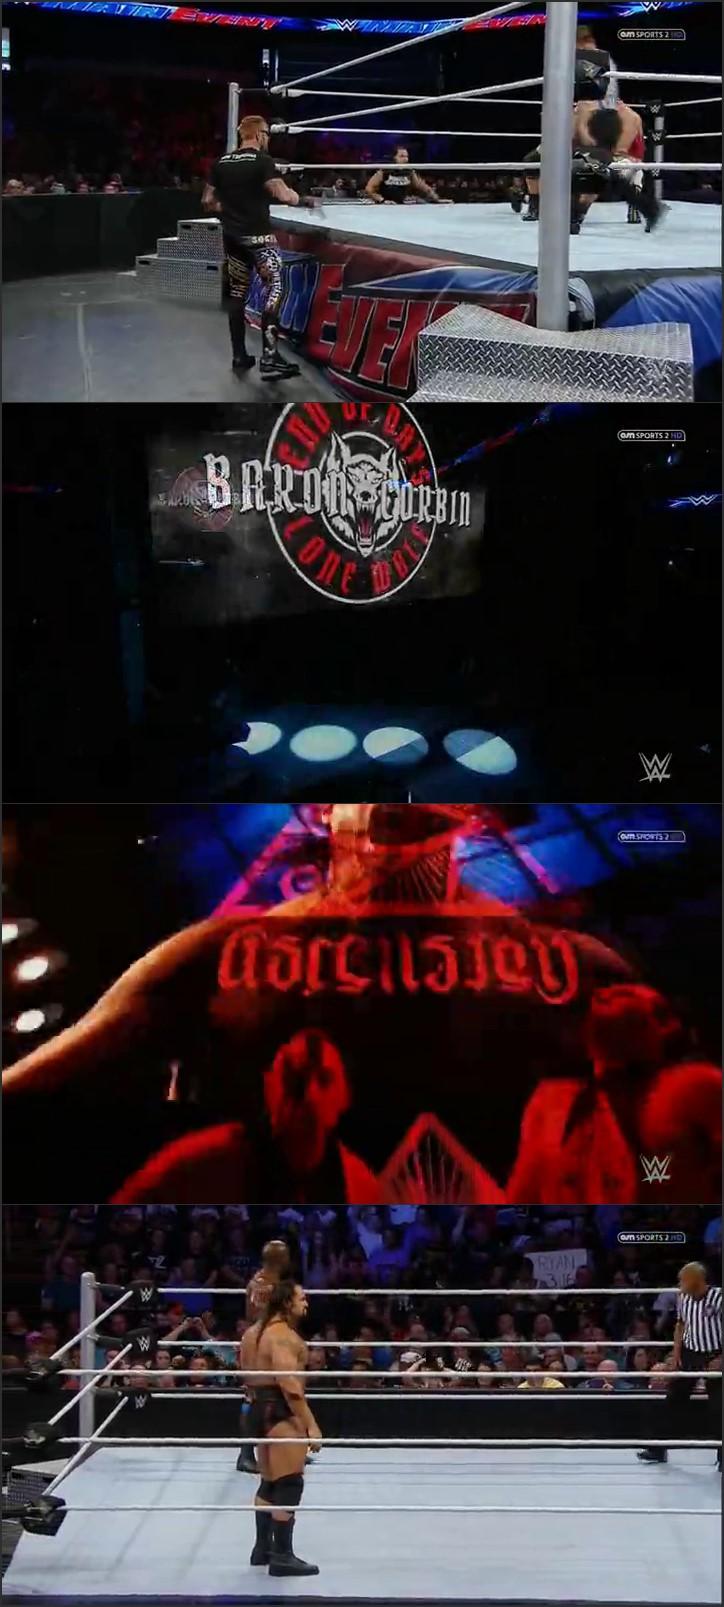 WWE Main Event 8th July 2016 worldfree4u.com